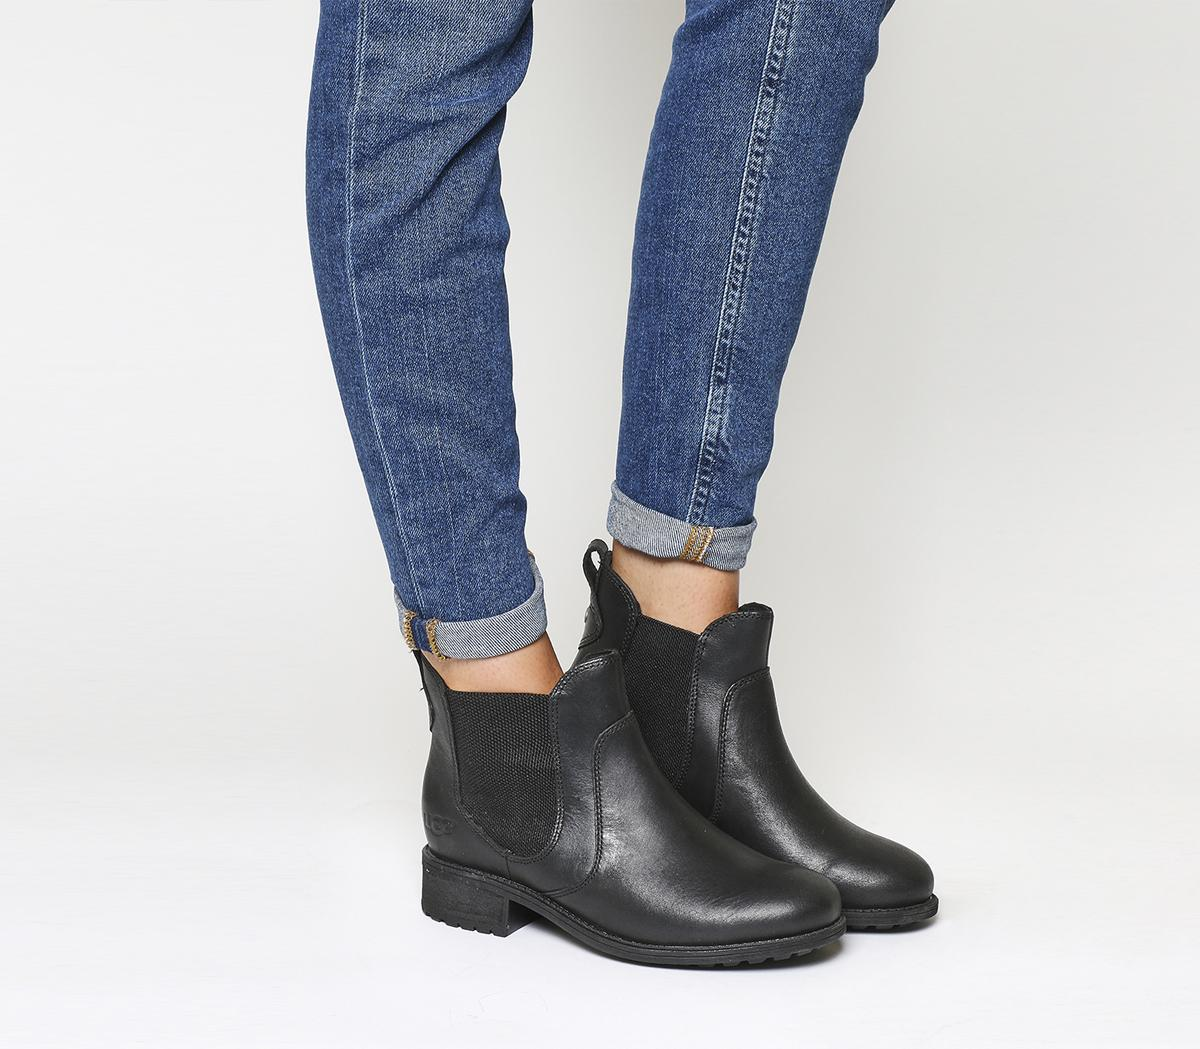 UGG Bonham Chelsea Boots Black - Ankle